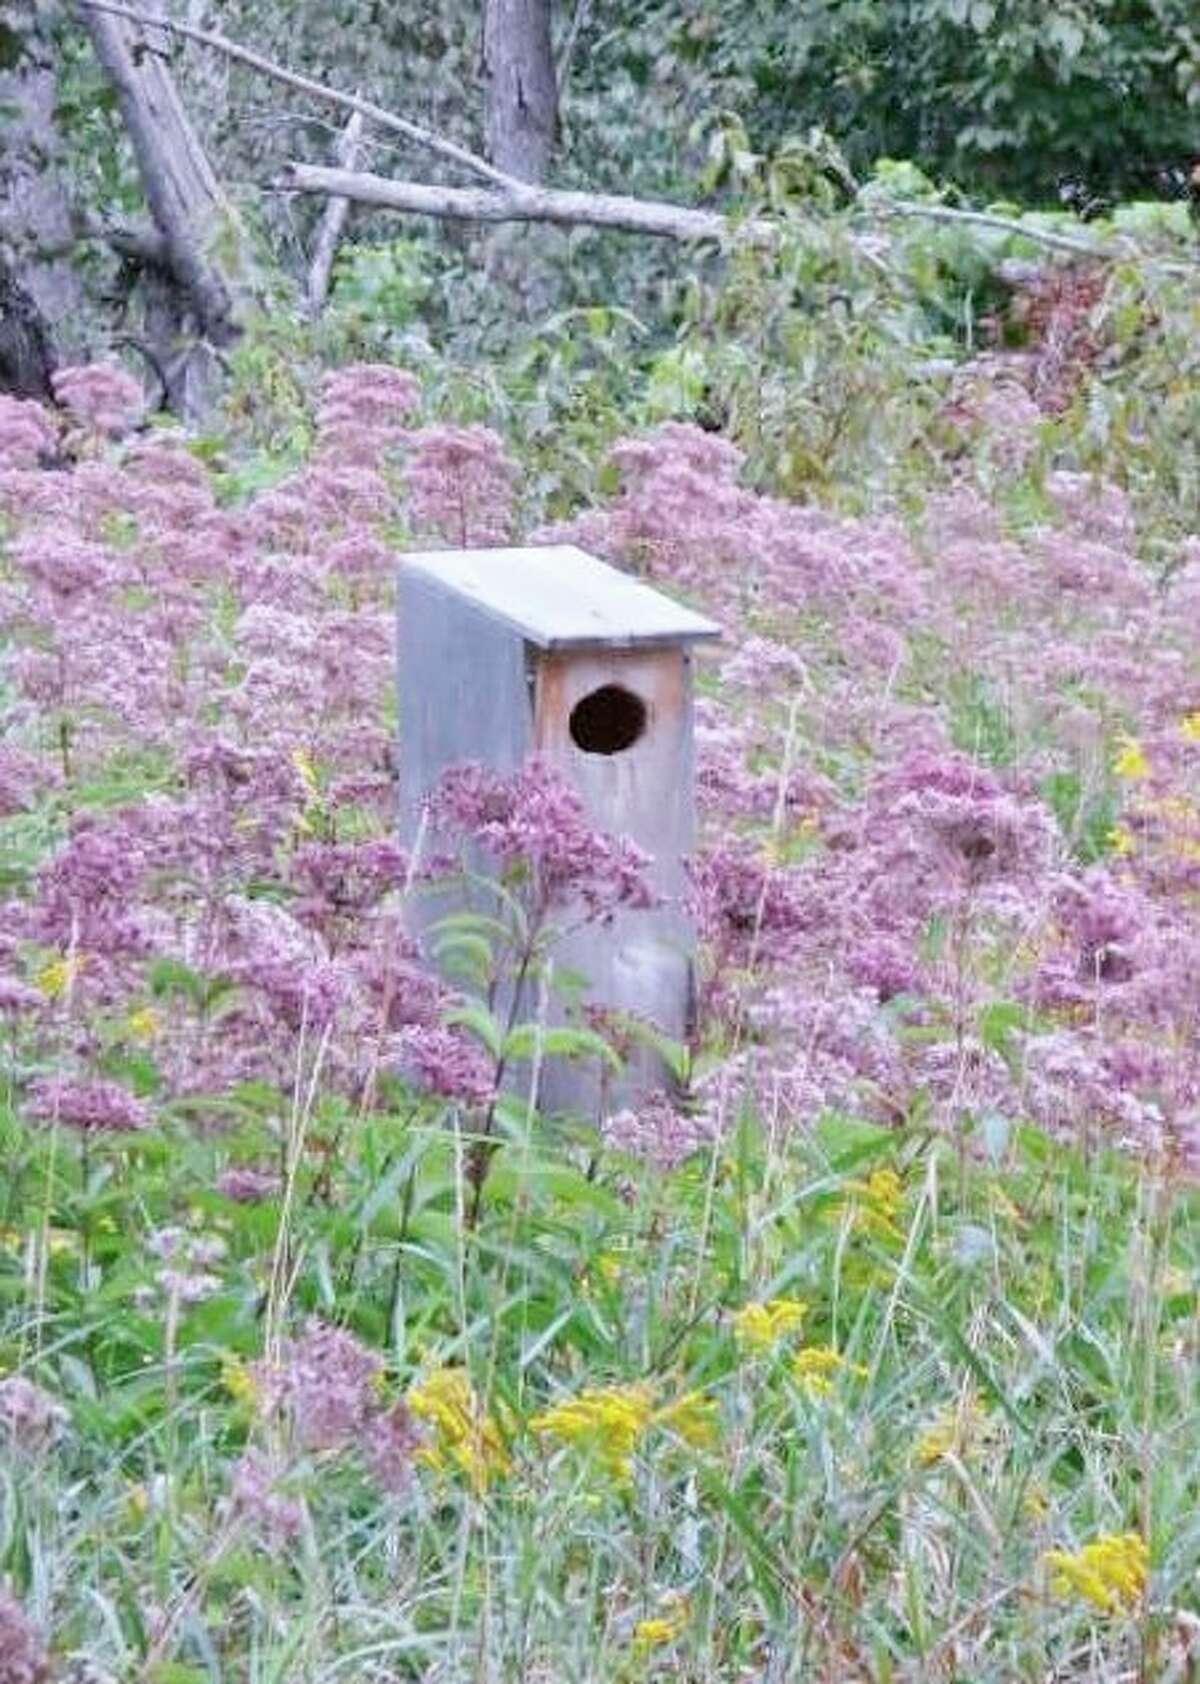 Duck box in Joe-Pye weed. (Photo provided/McLean Nature Preserve)